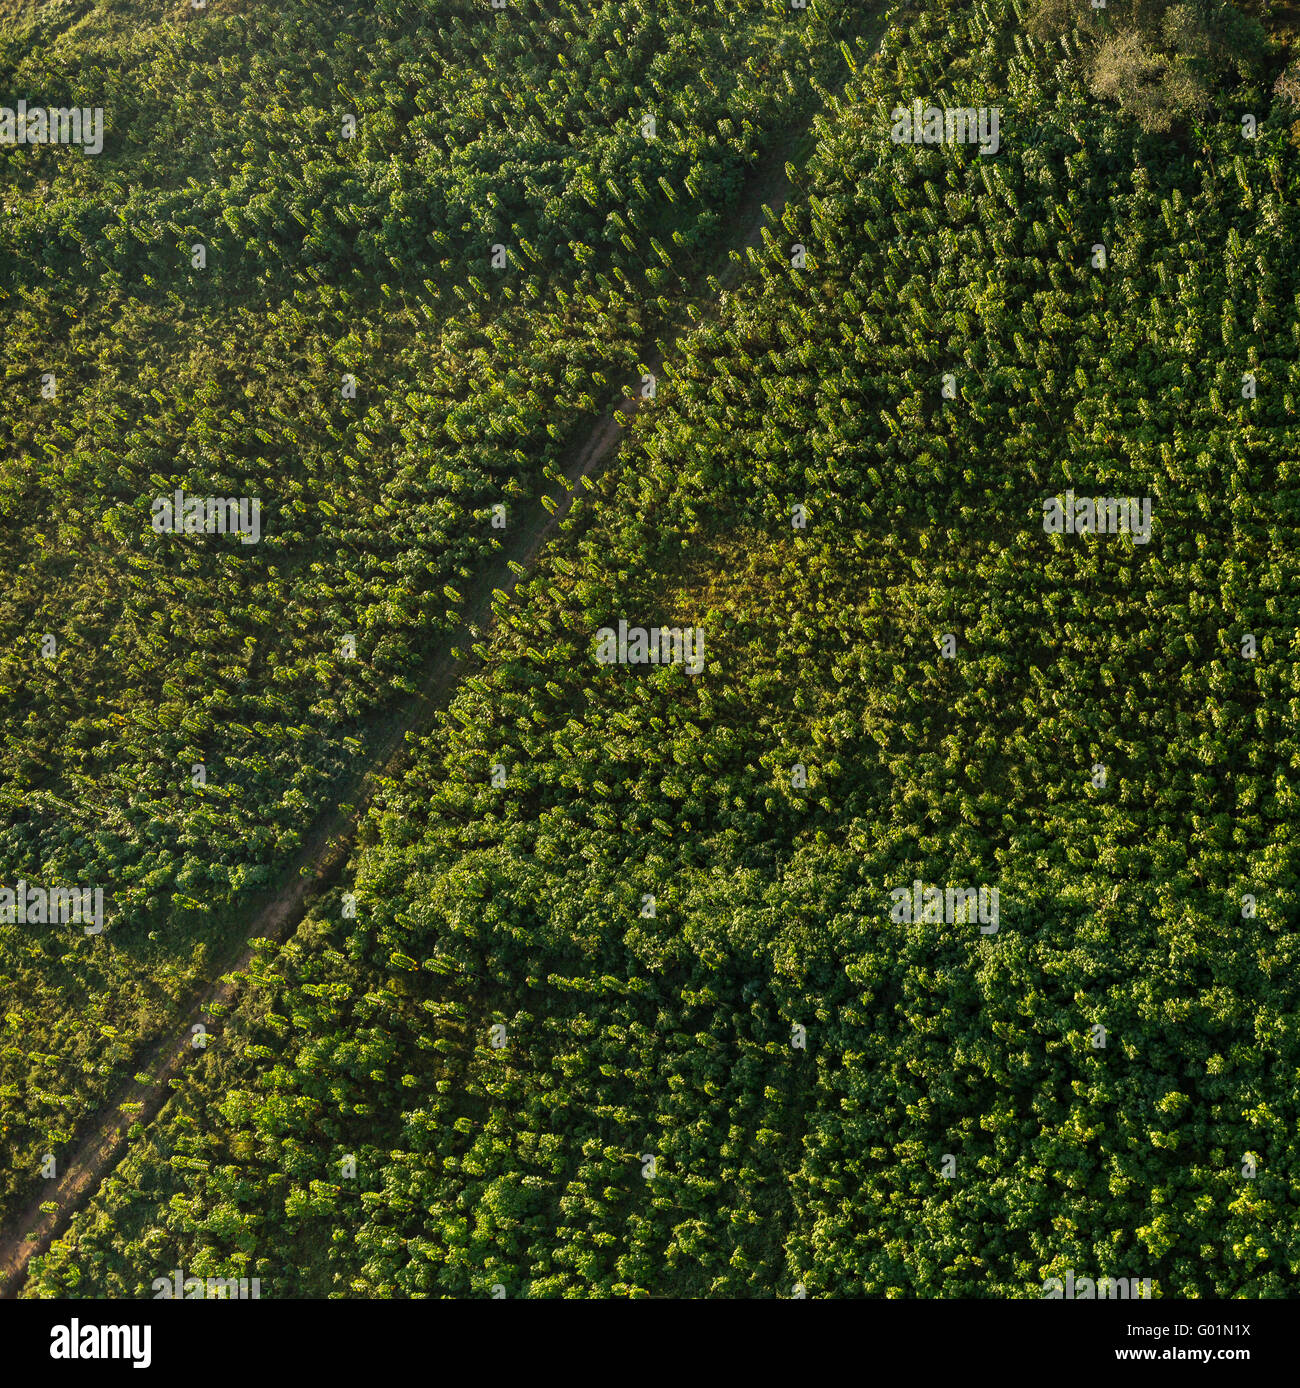 OSA PENINSULA, COSTA RICA - Aerial of two year old teak trees on sustainable teak plantation at Puerto Jimenez. - Stock Image